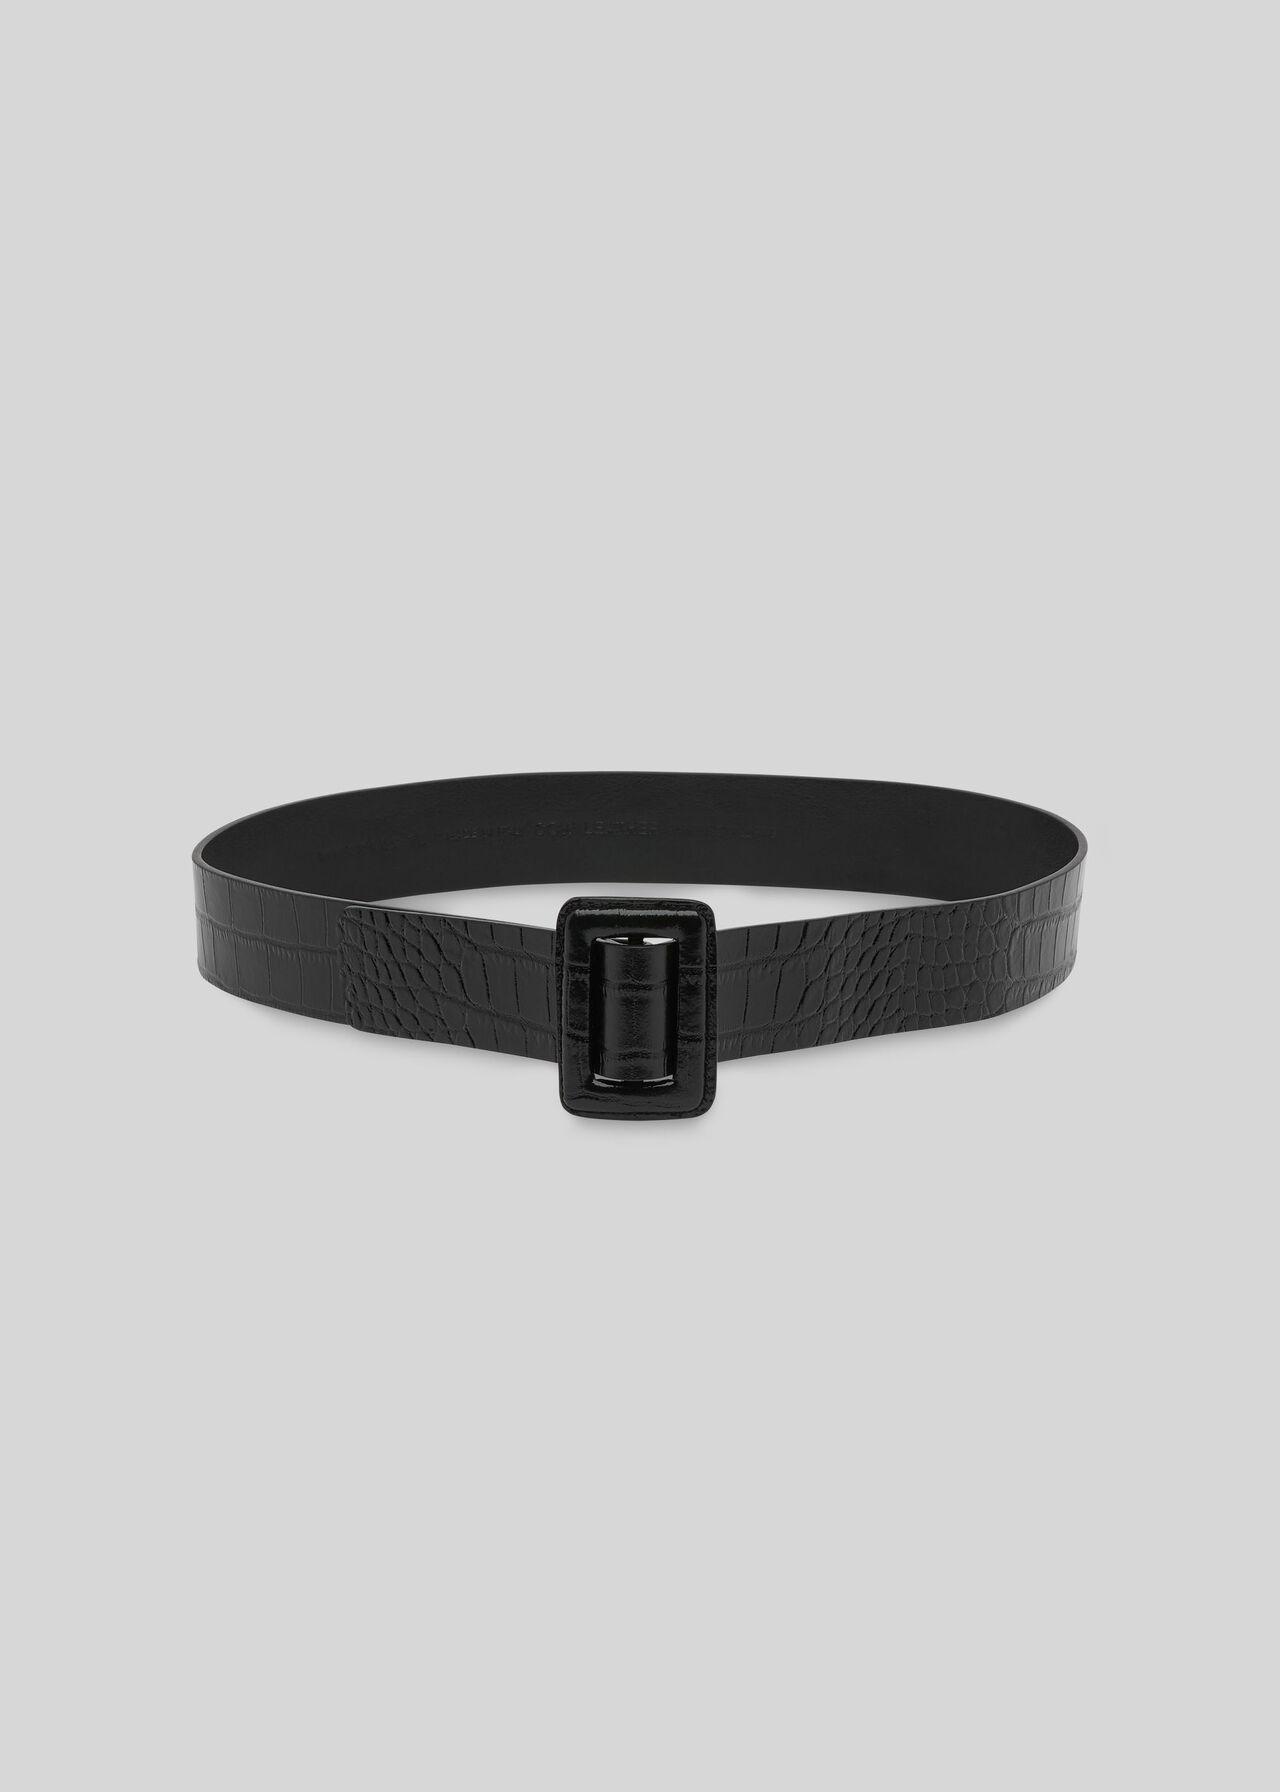 Croc Leather Belt Black